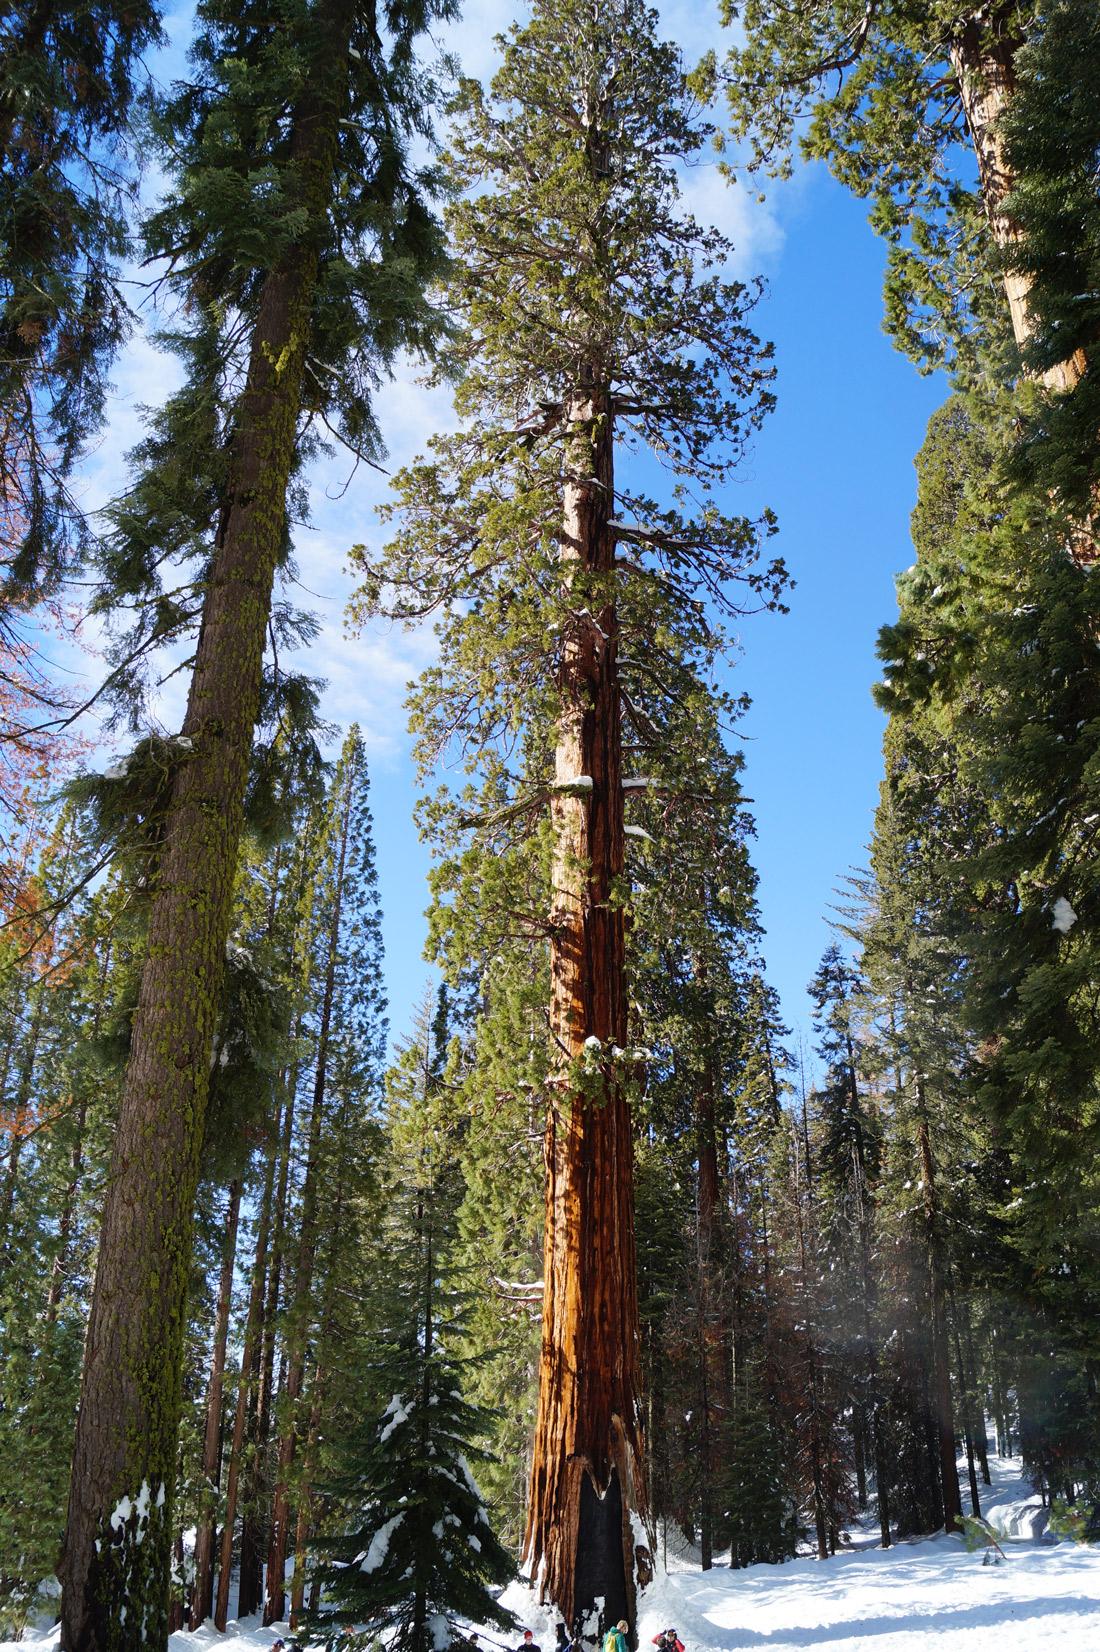 Bag-at-you---Travel-blog---General-Shermand-Tree-Sequoia